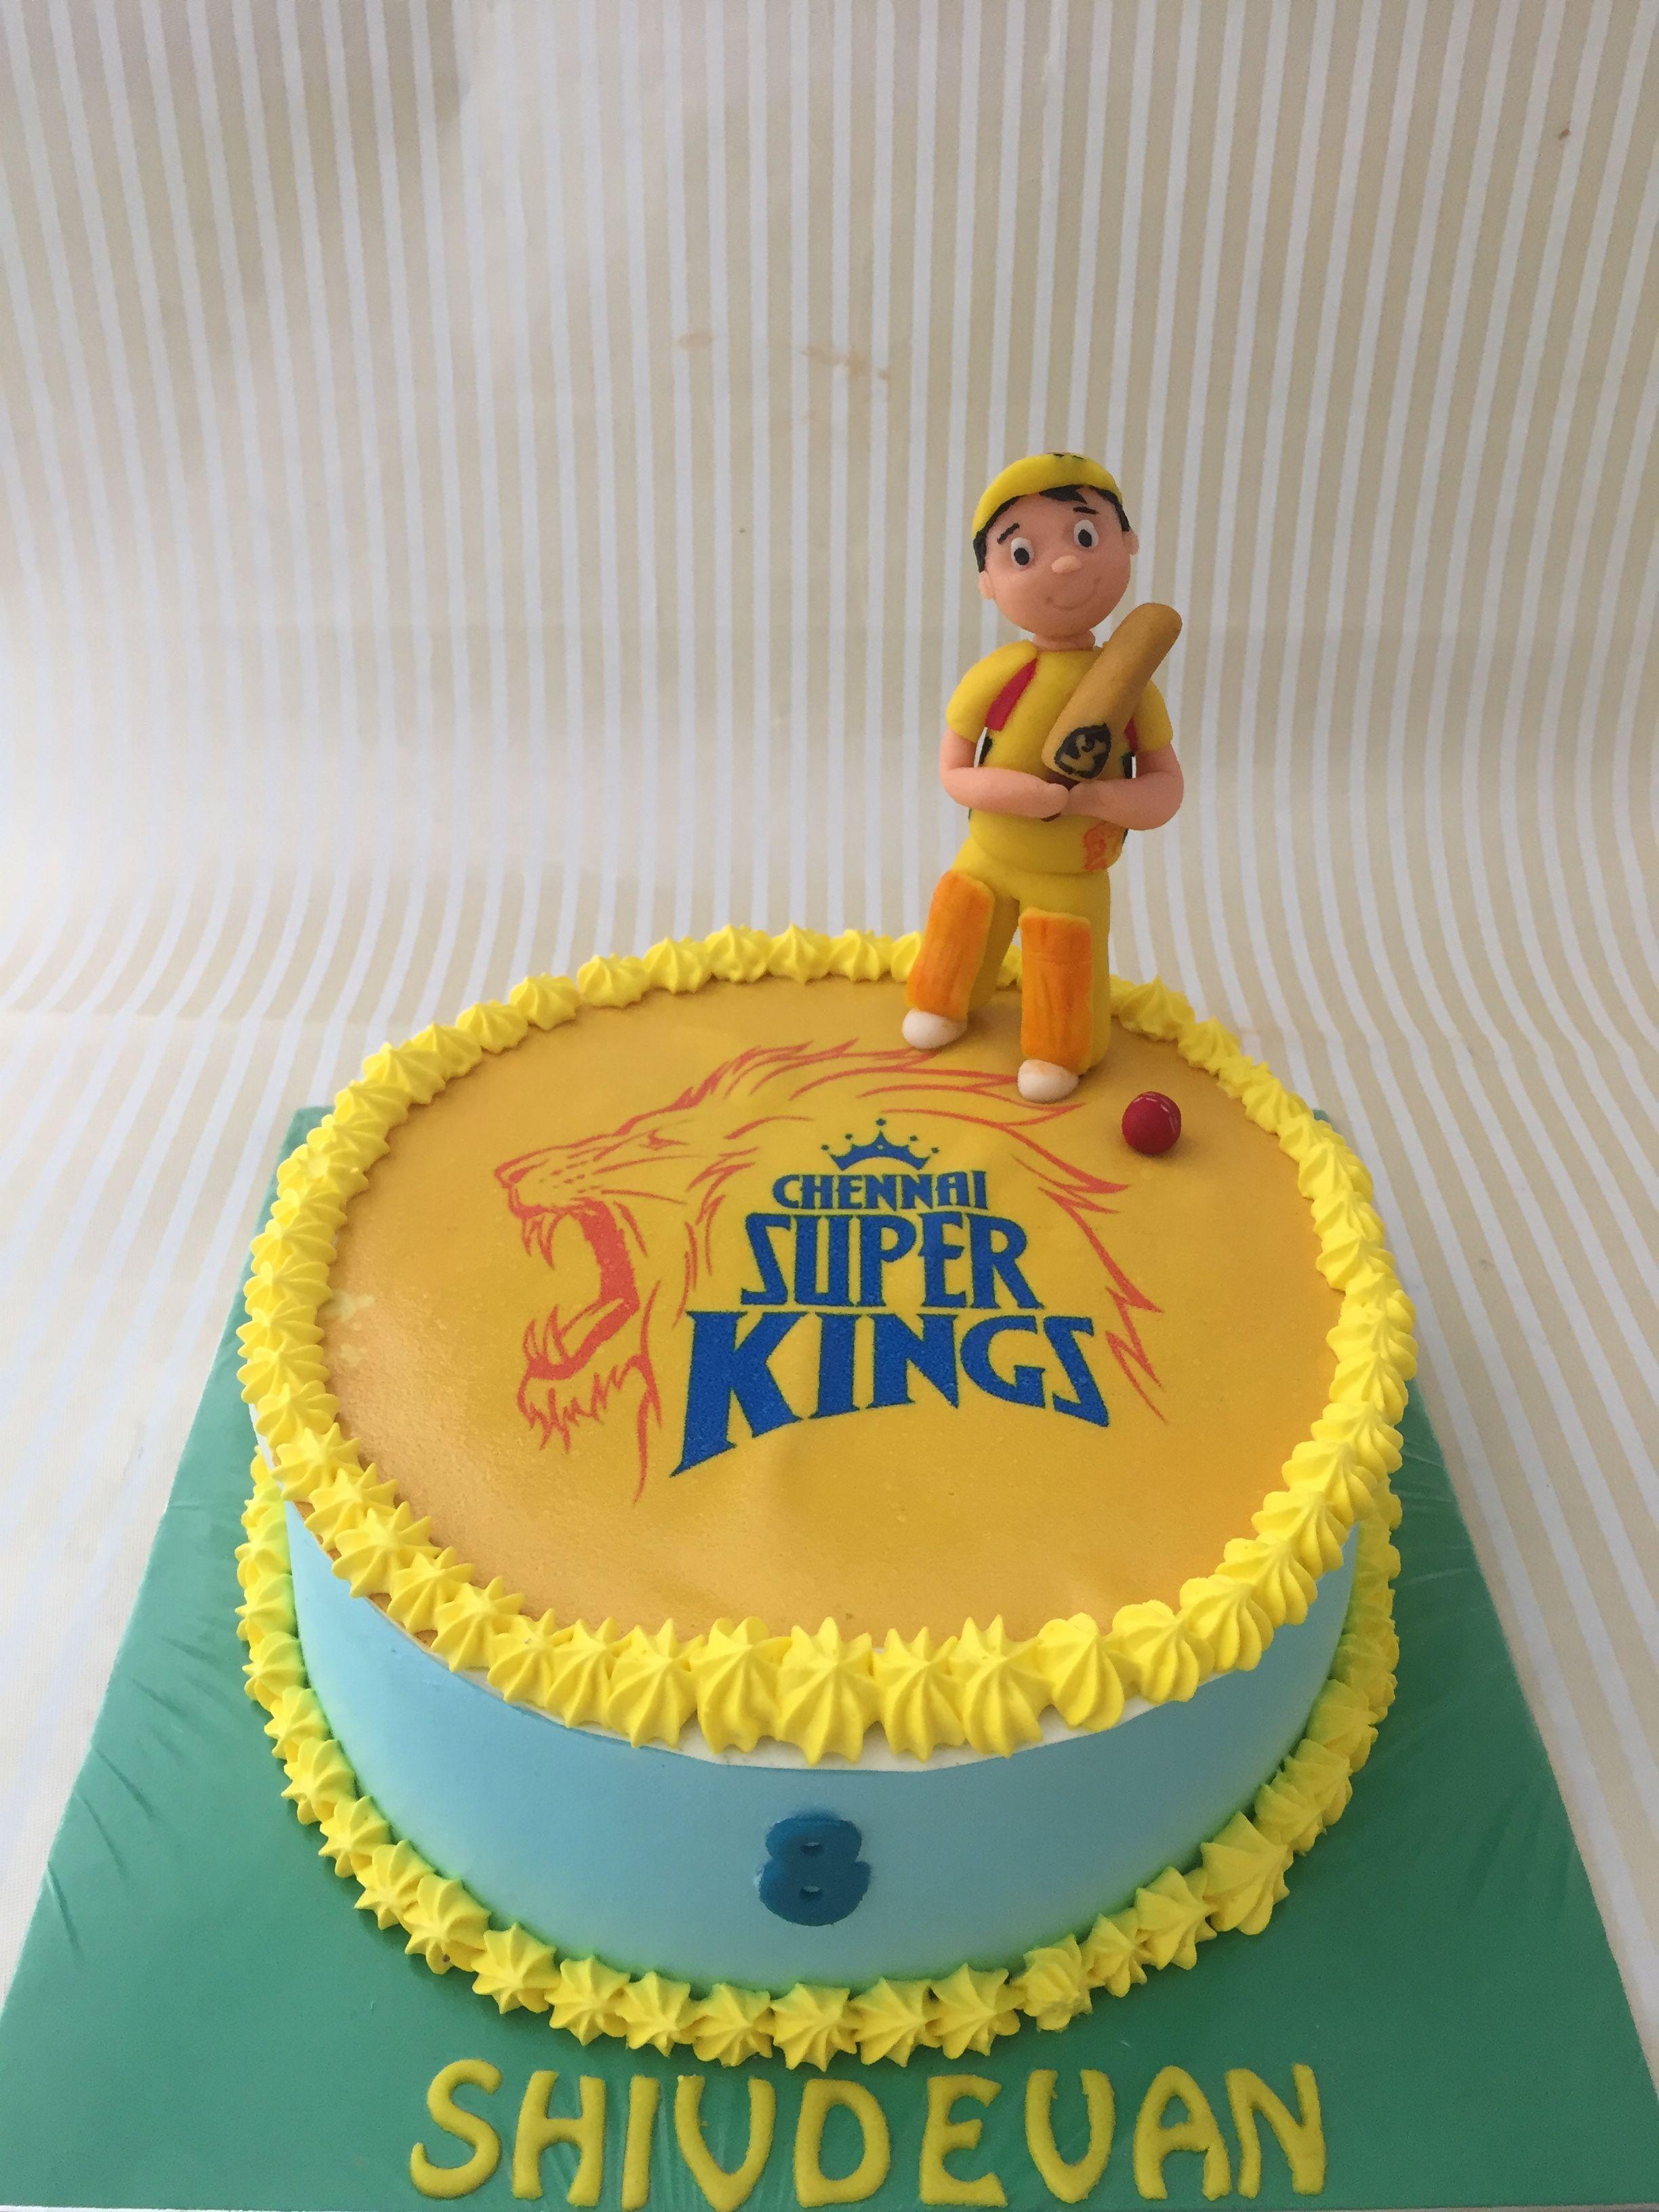 Cool Csk Cricket Cake Cricket Cake Cricket Theme Cake Themed Cakes Funny Birthday Cards Online Elaedamsfinfo